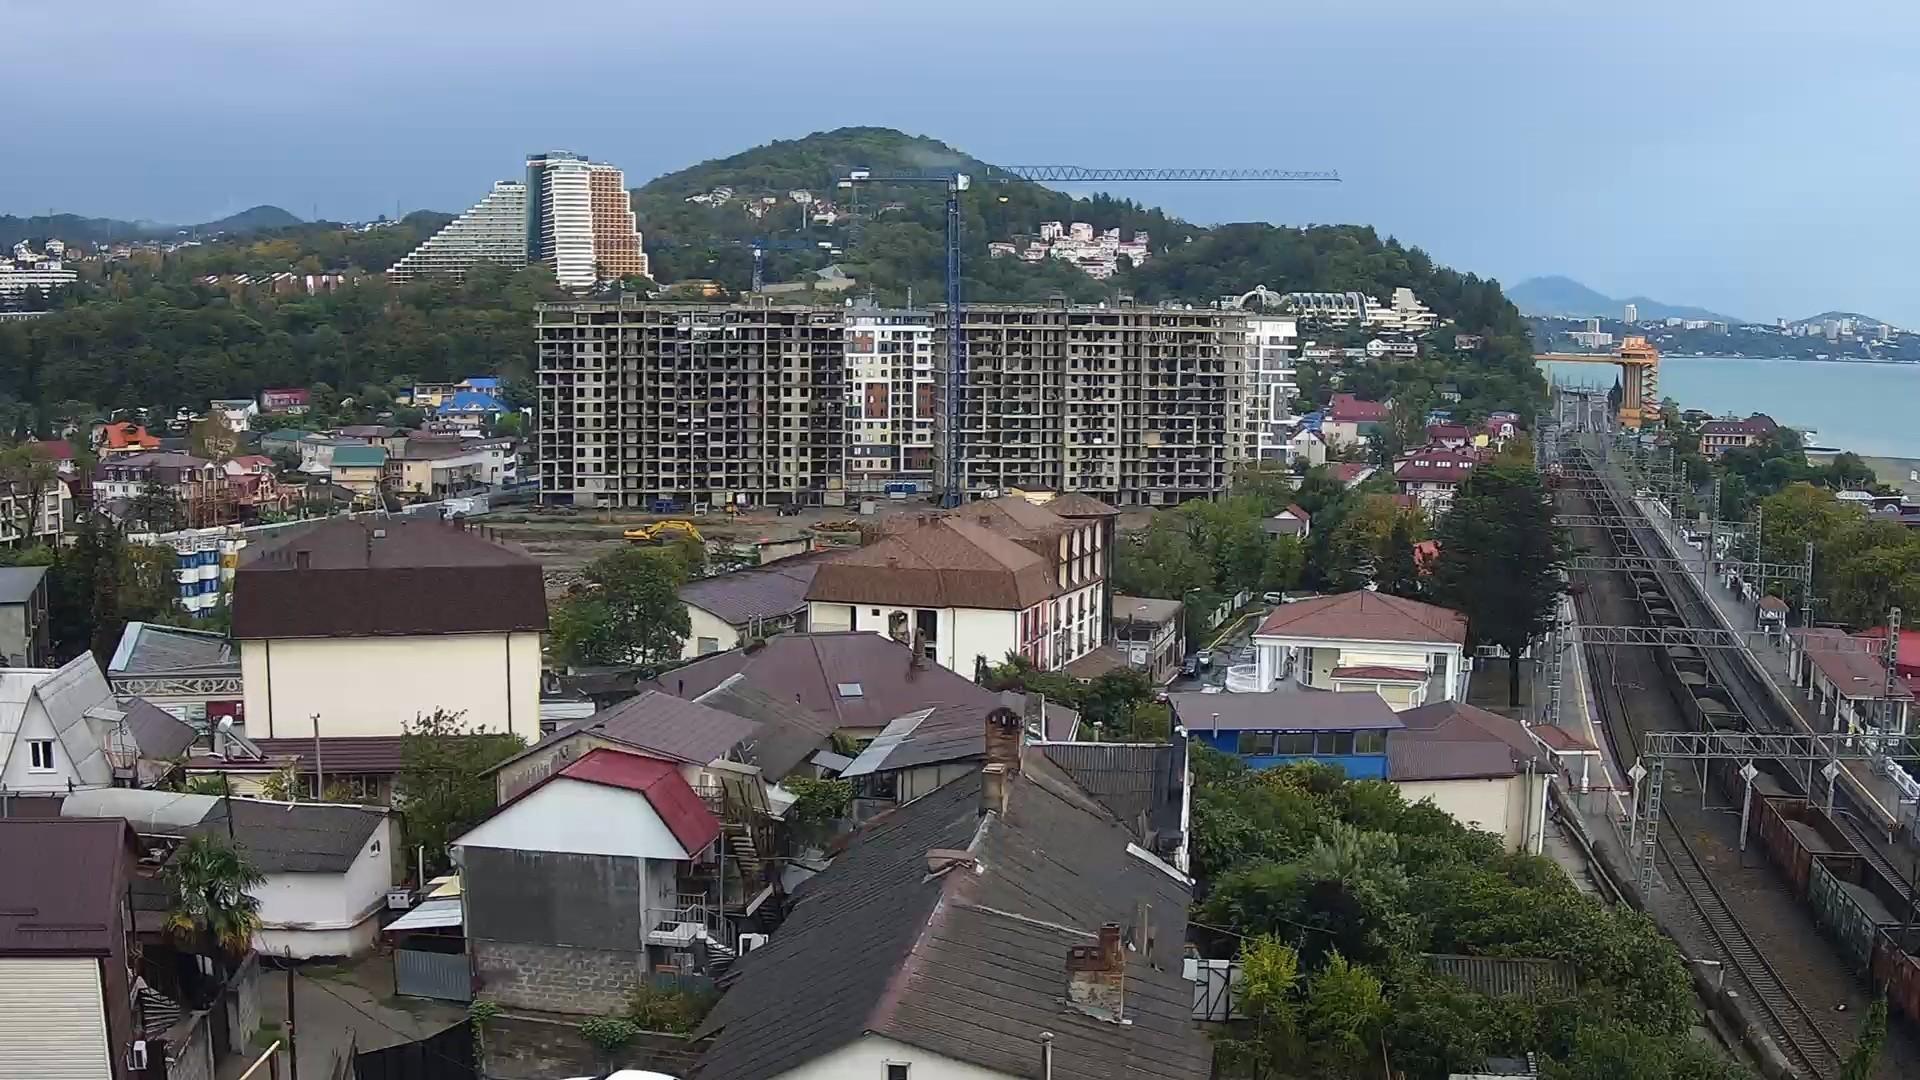 Вебкамера на строй площадке ЖК «Каравелла Португалии», панорама на фоне Дагомыса